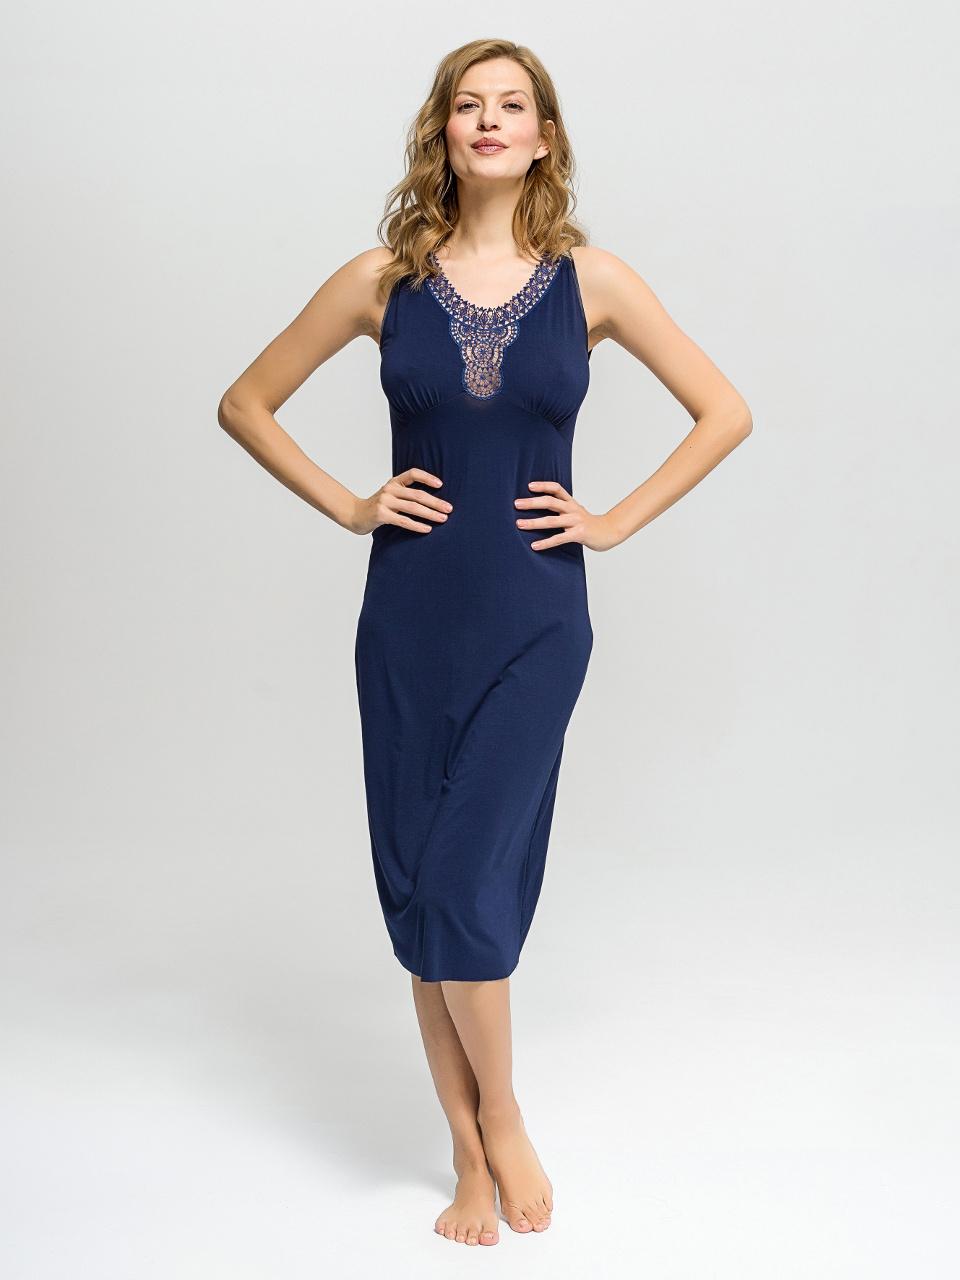 B36 Camicia da notte<br />03 Navy Blue, 63 Hyacinth